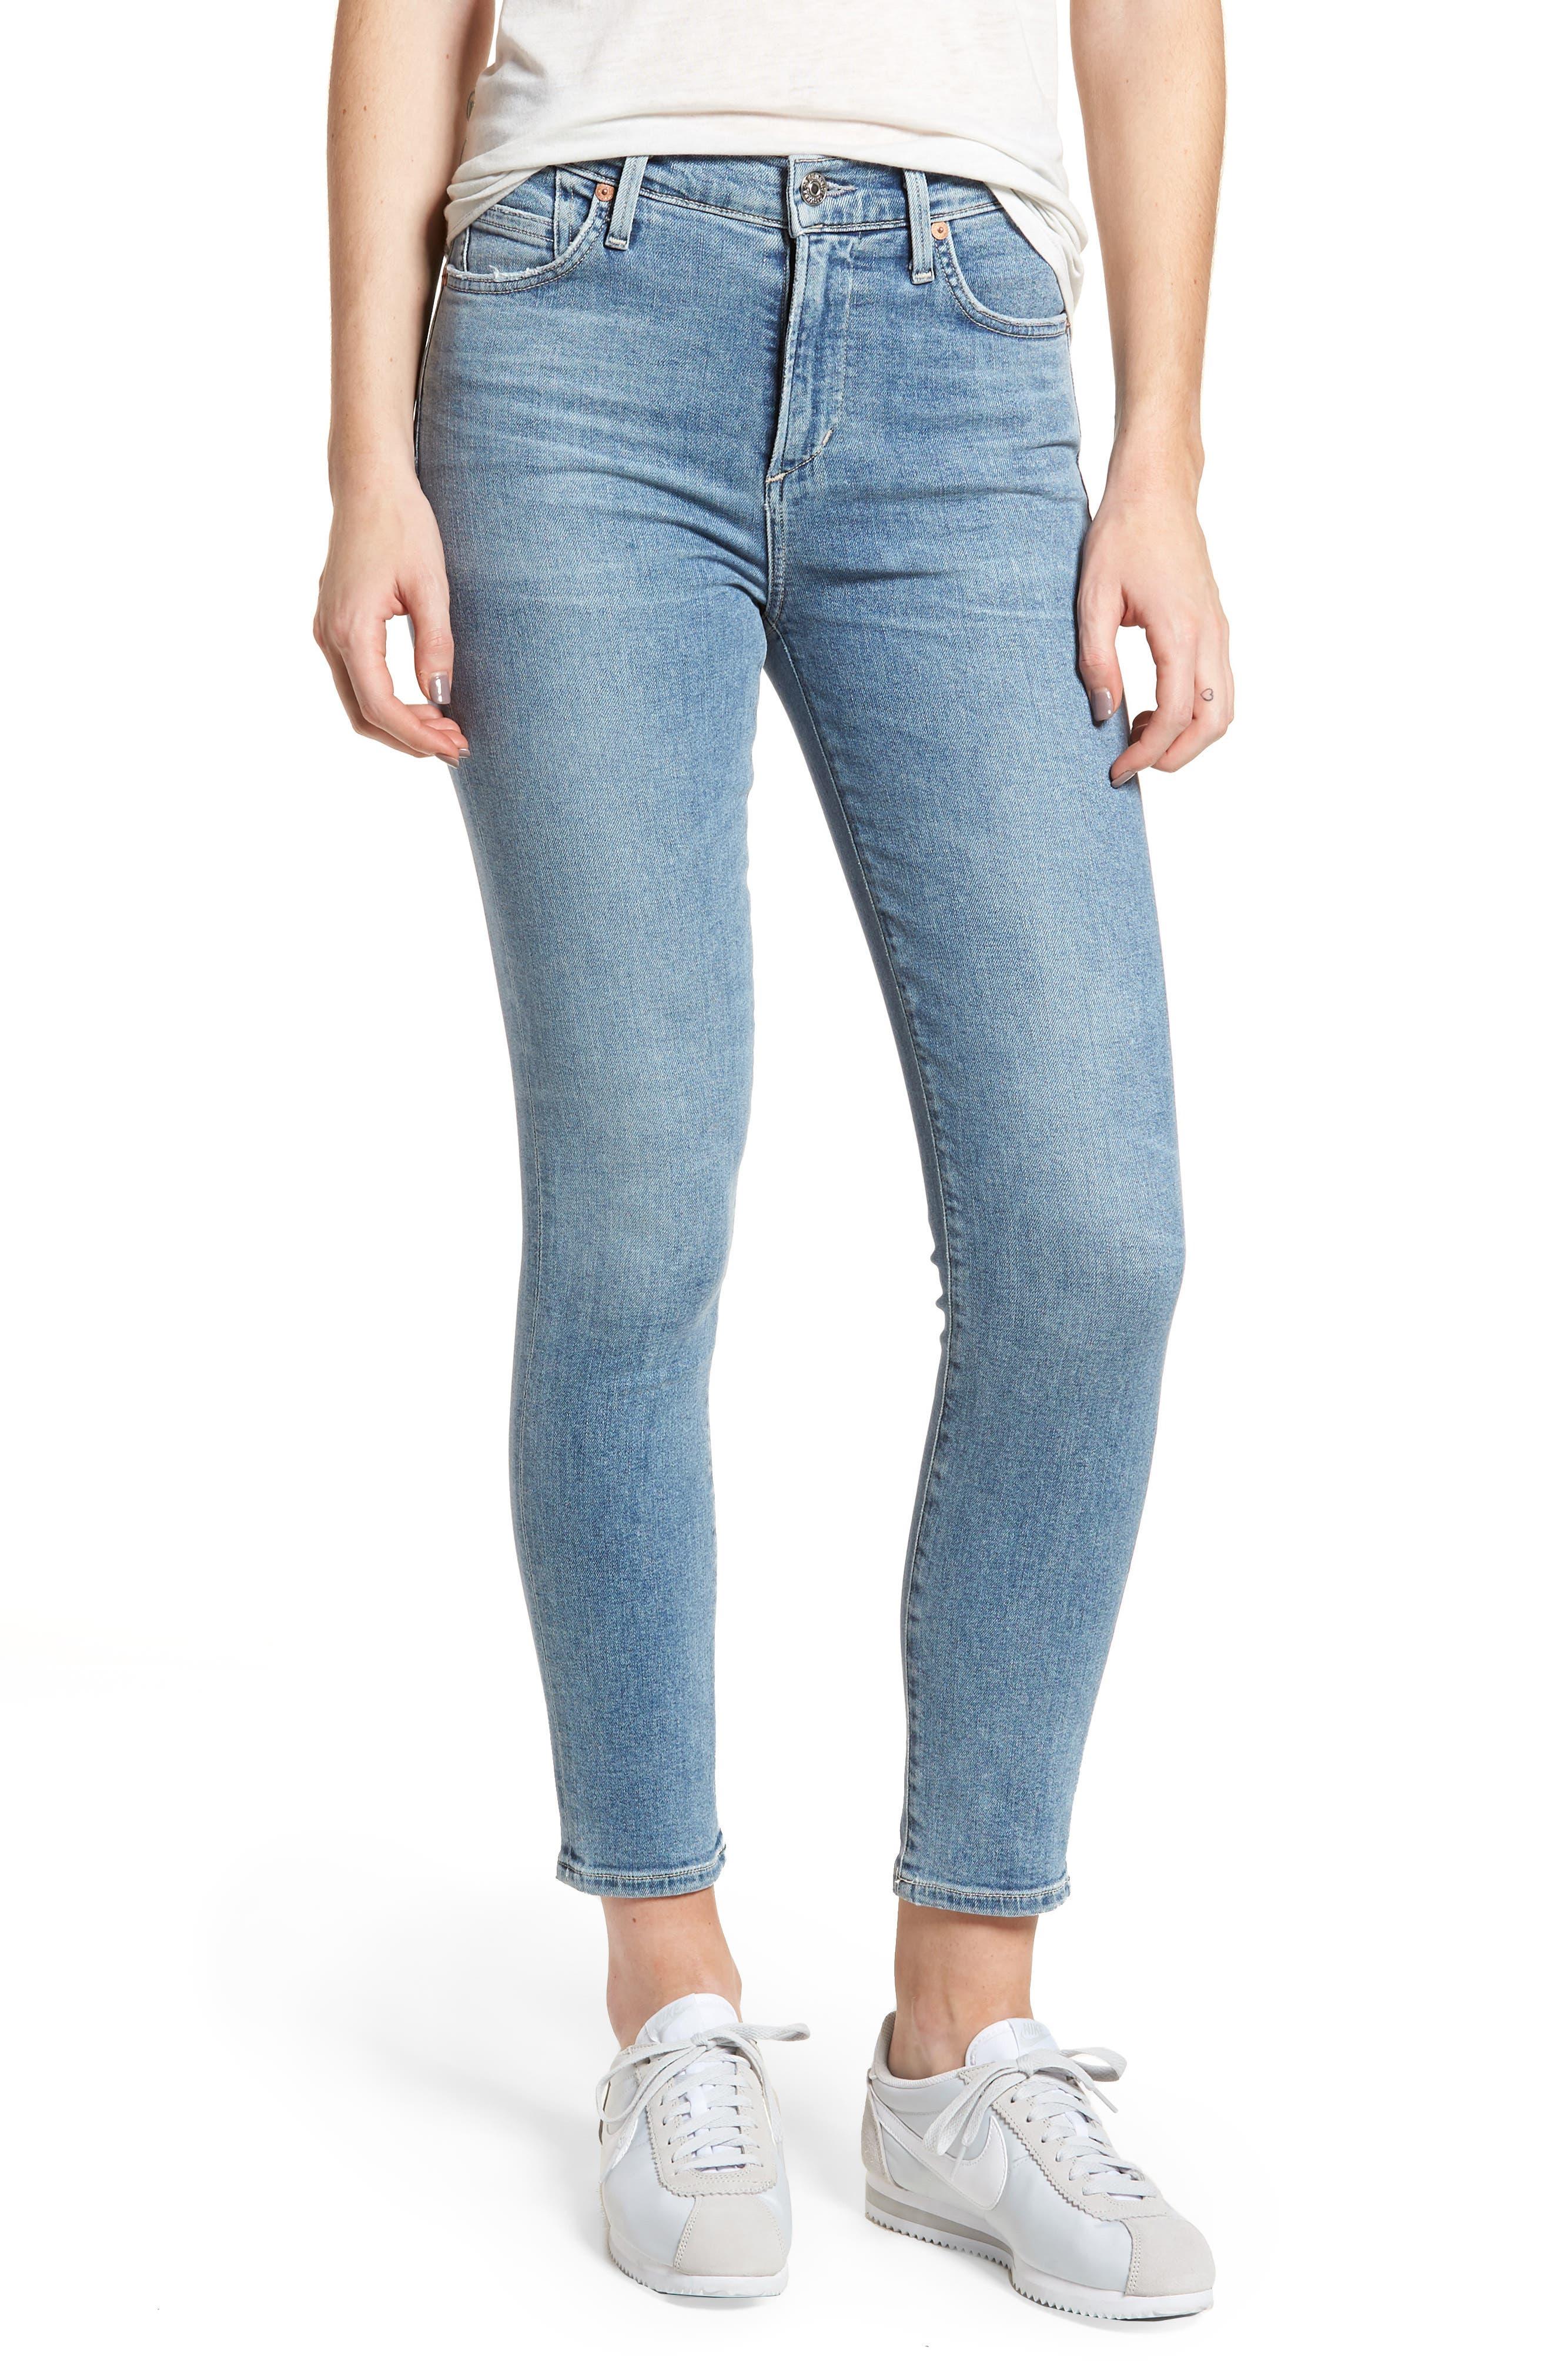 Rocket High Waist Crop Skinny Jeans,                         Main,                         color, Firestone